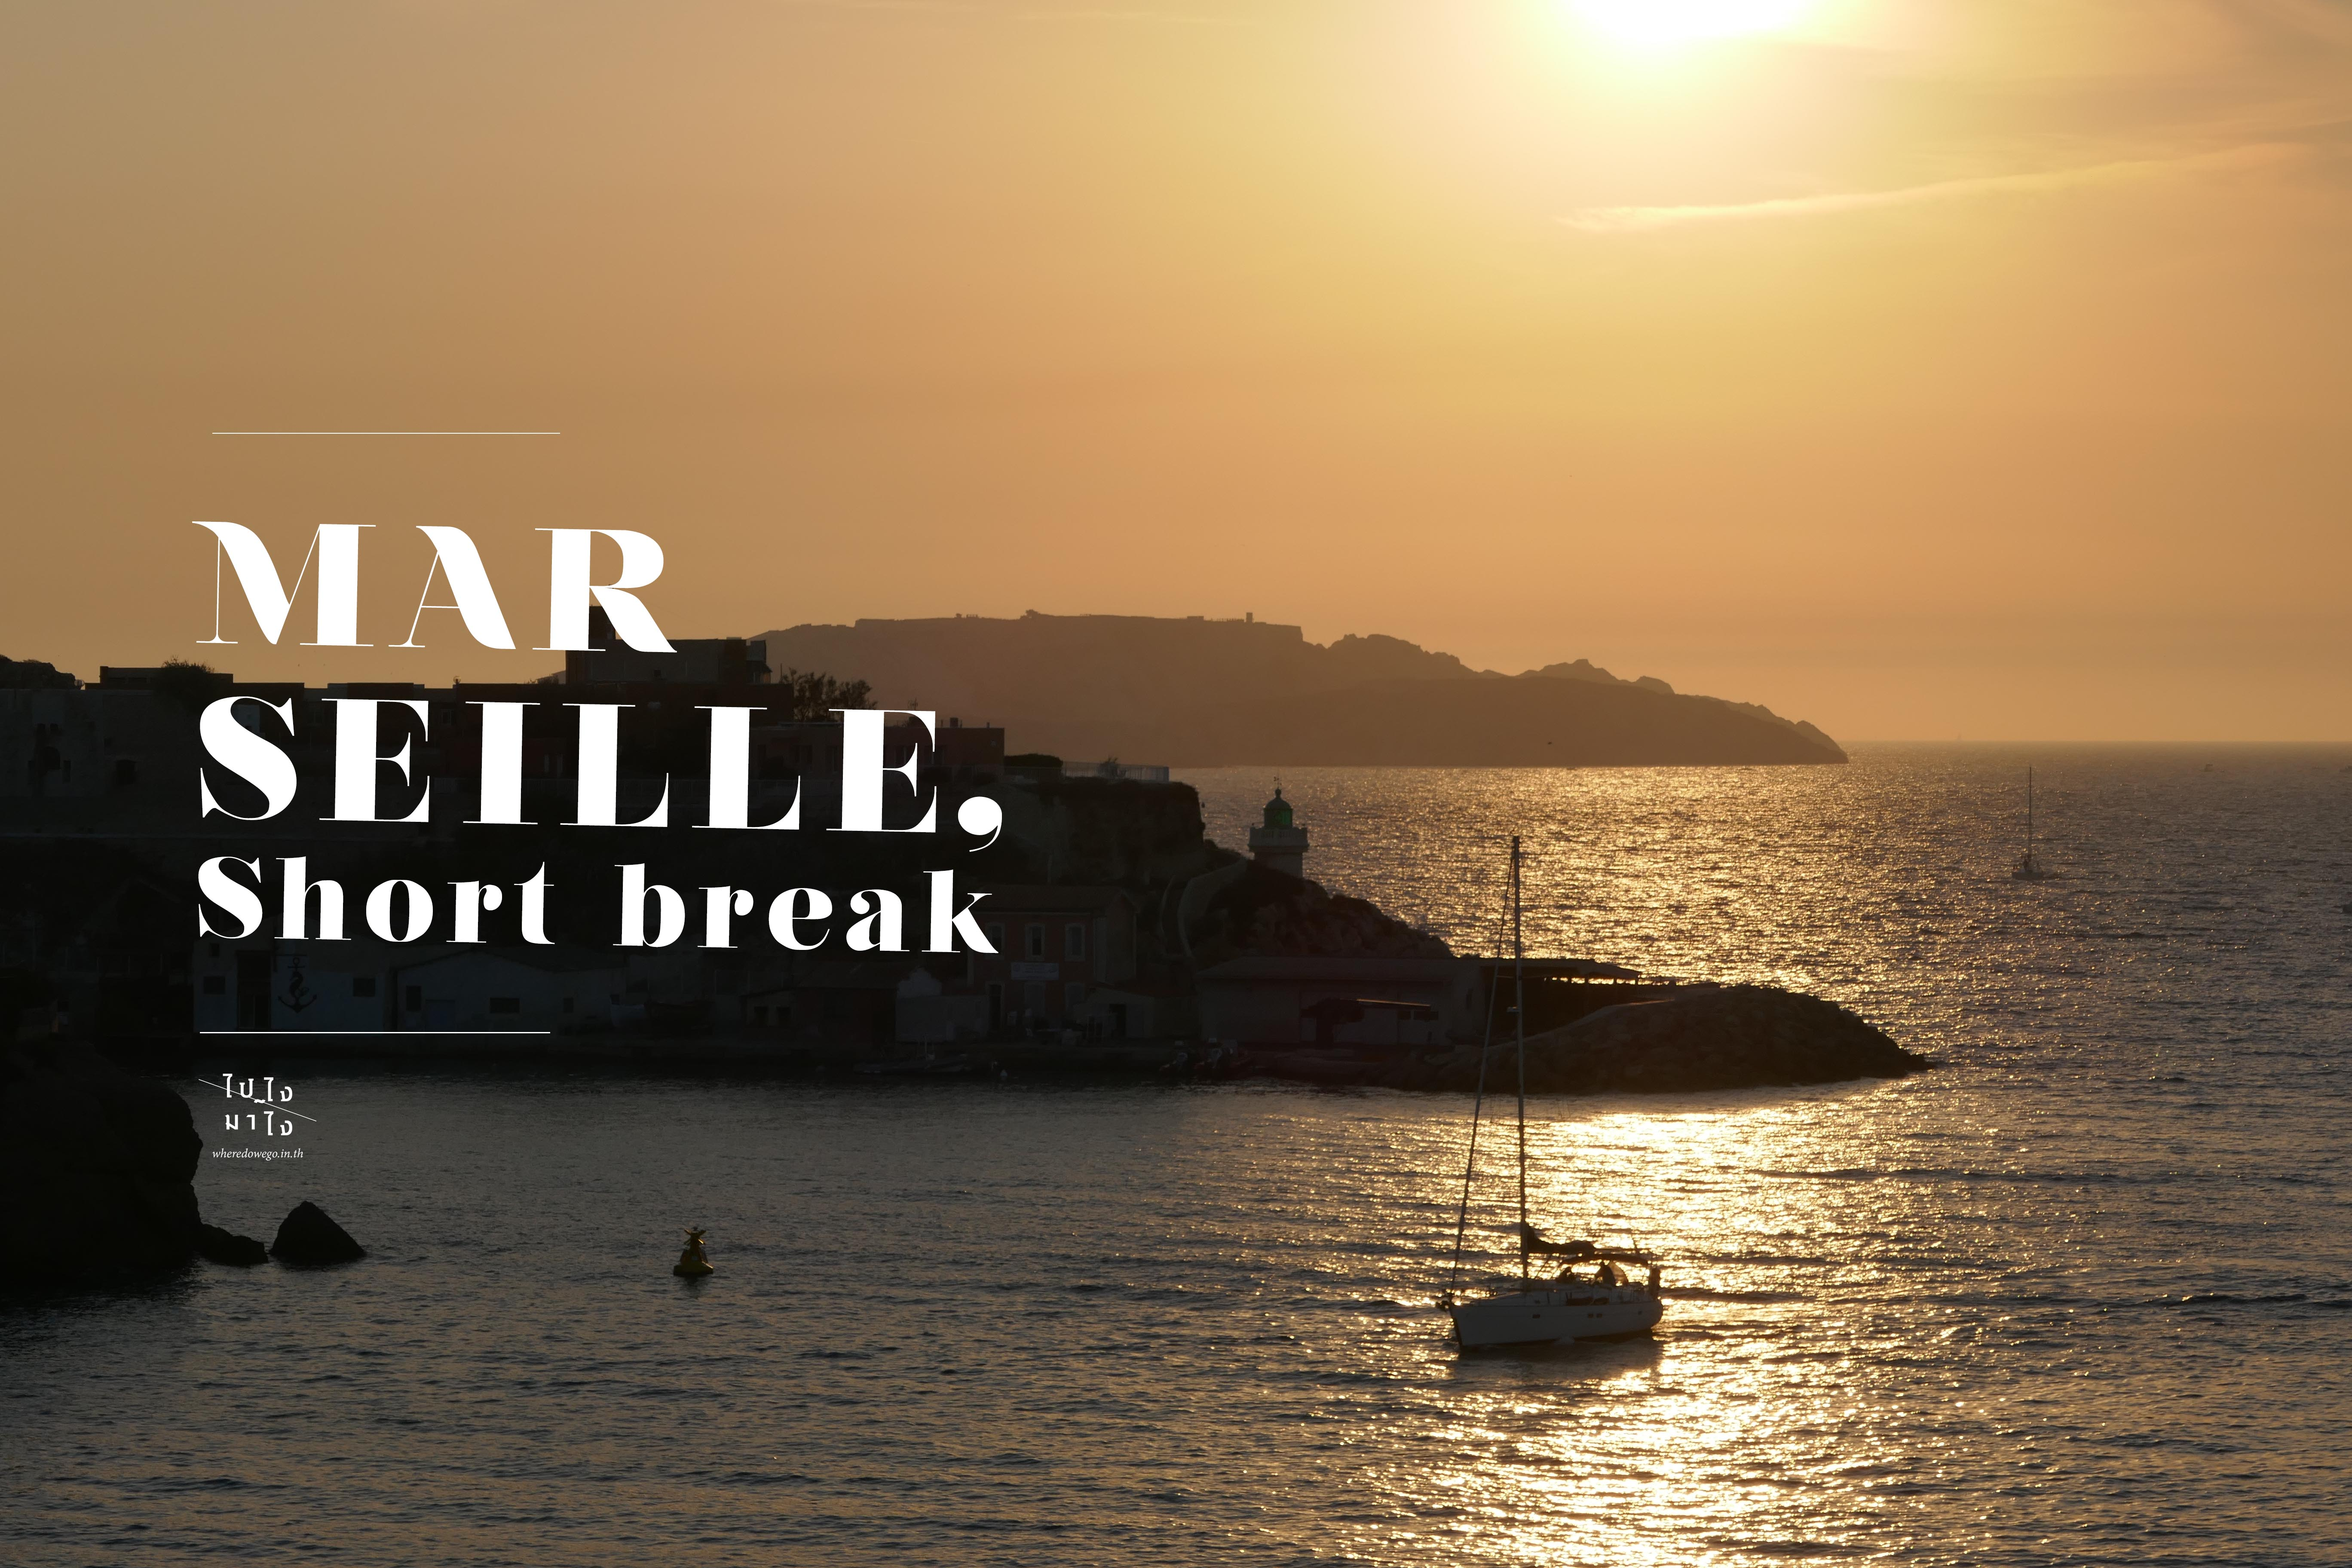 Marseille Short Break มาพักกาย พักใจ กับแดดอ่อนๆริมทะเลที่มาร์เซย